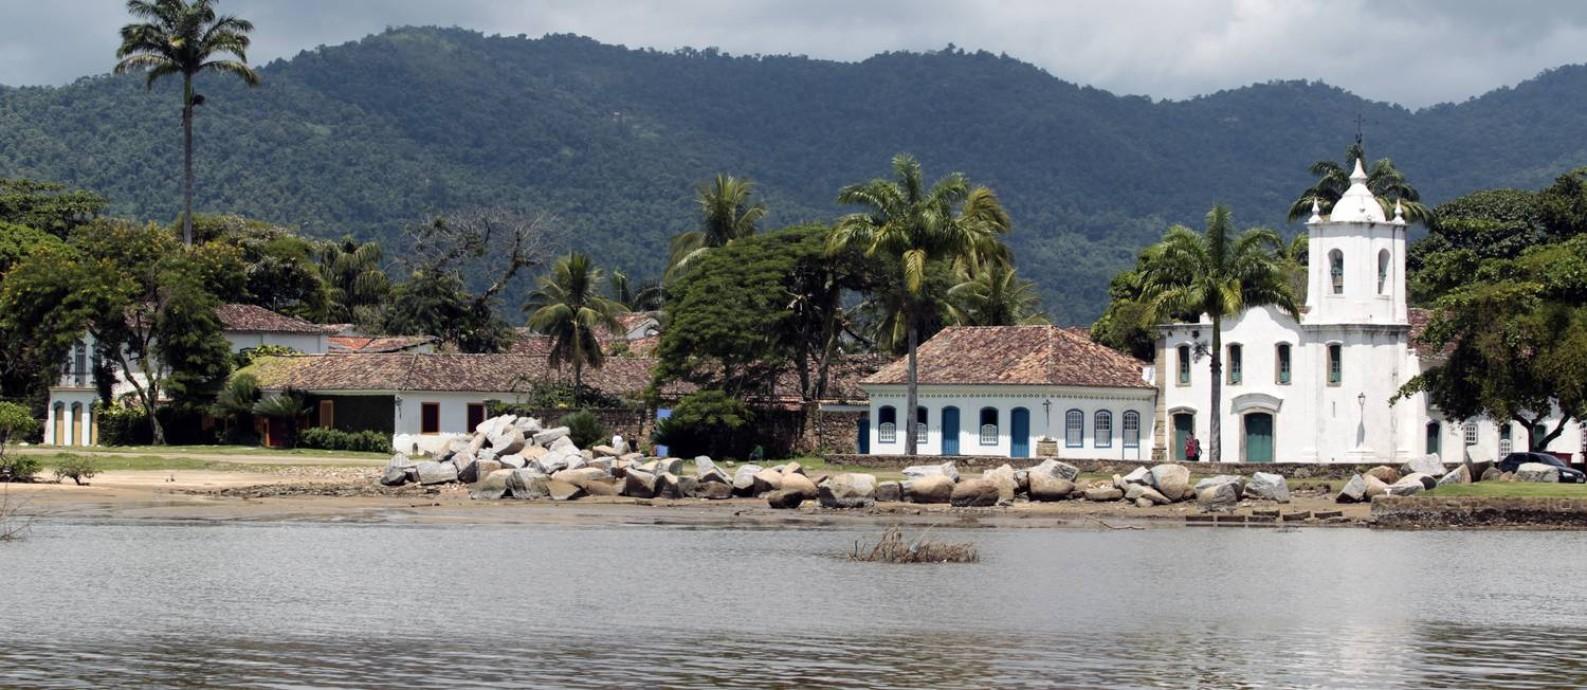 O Centro Histórico de Paraty: cidade vai receber a Flip de 25 a 29 de julho Foto: Luiz Ackermann / Agência O Globo